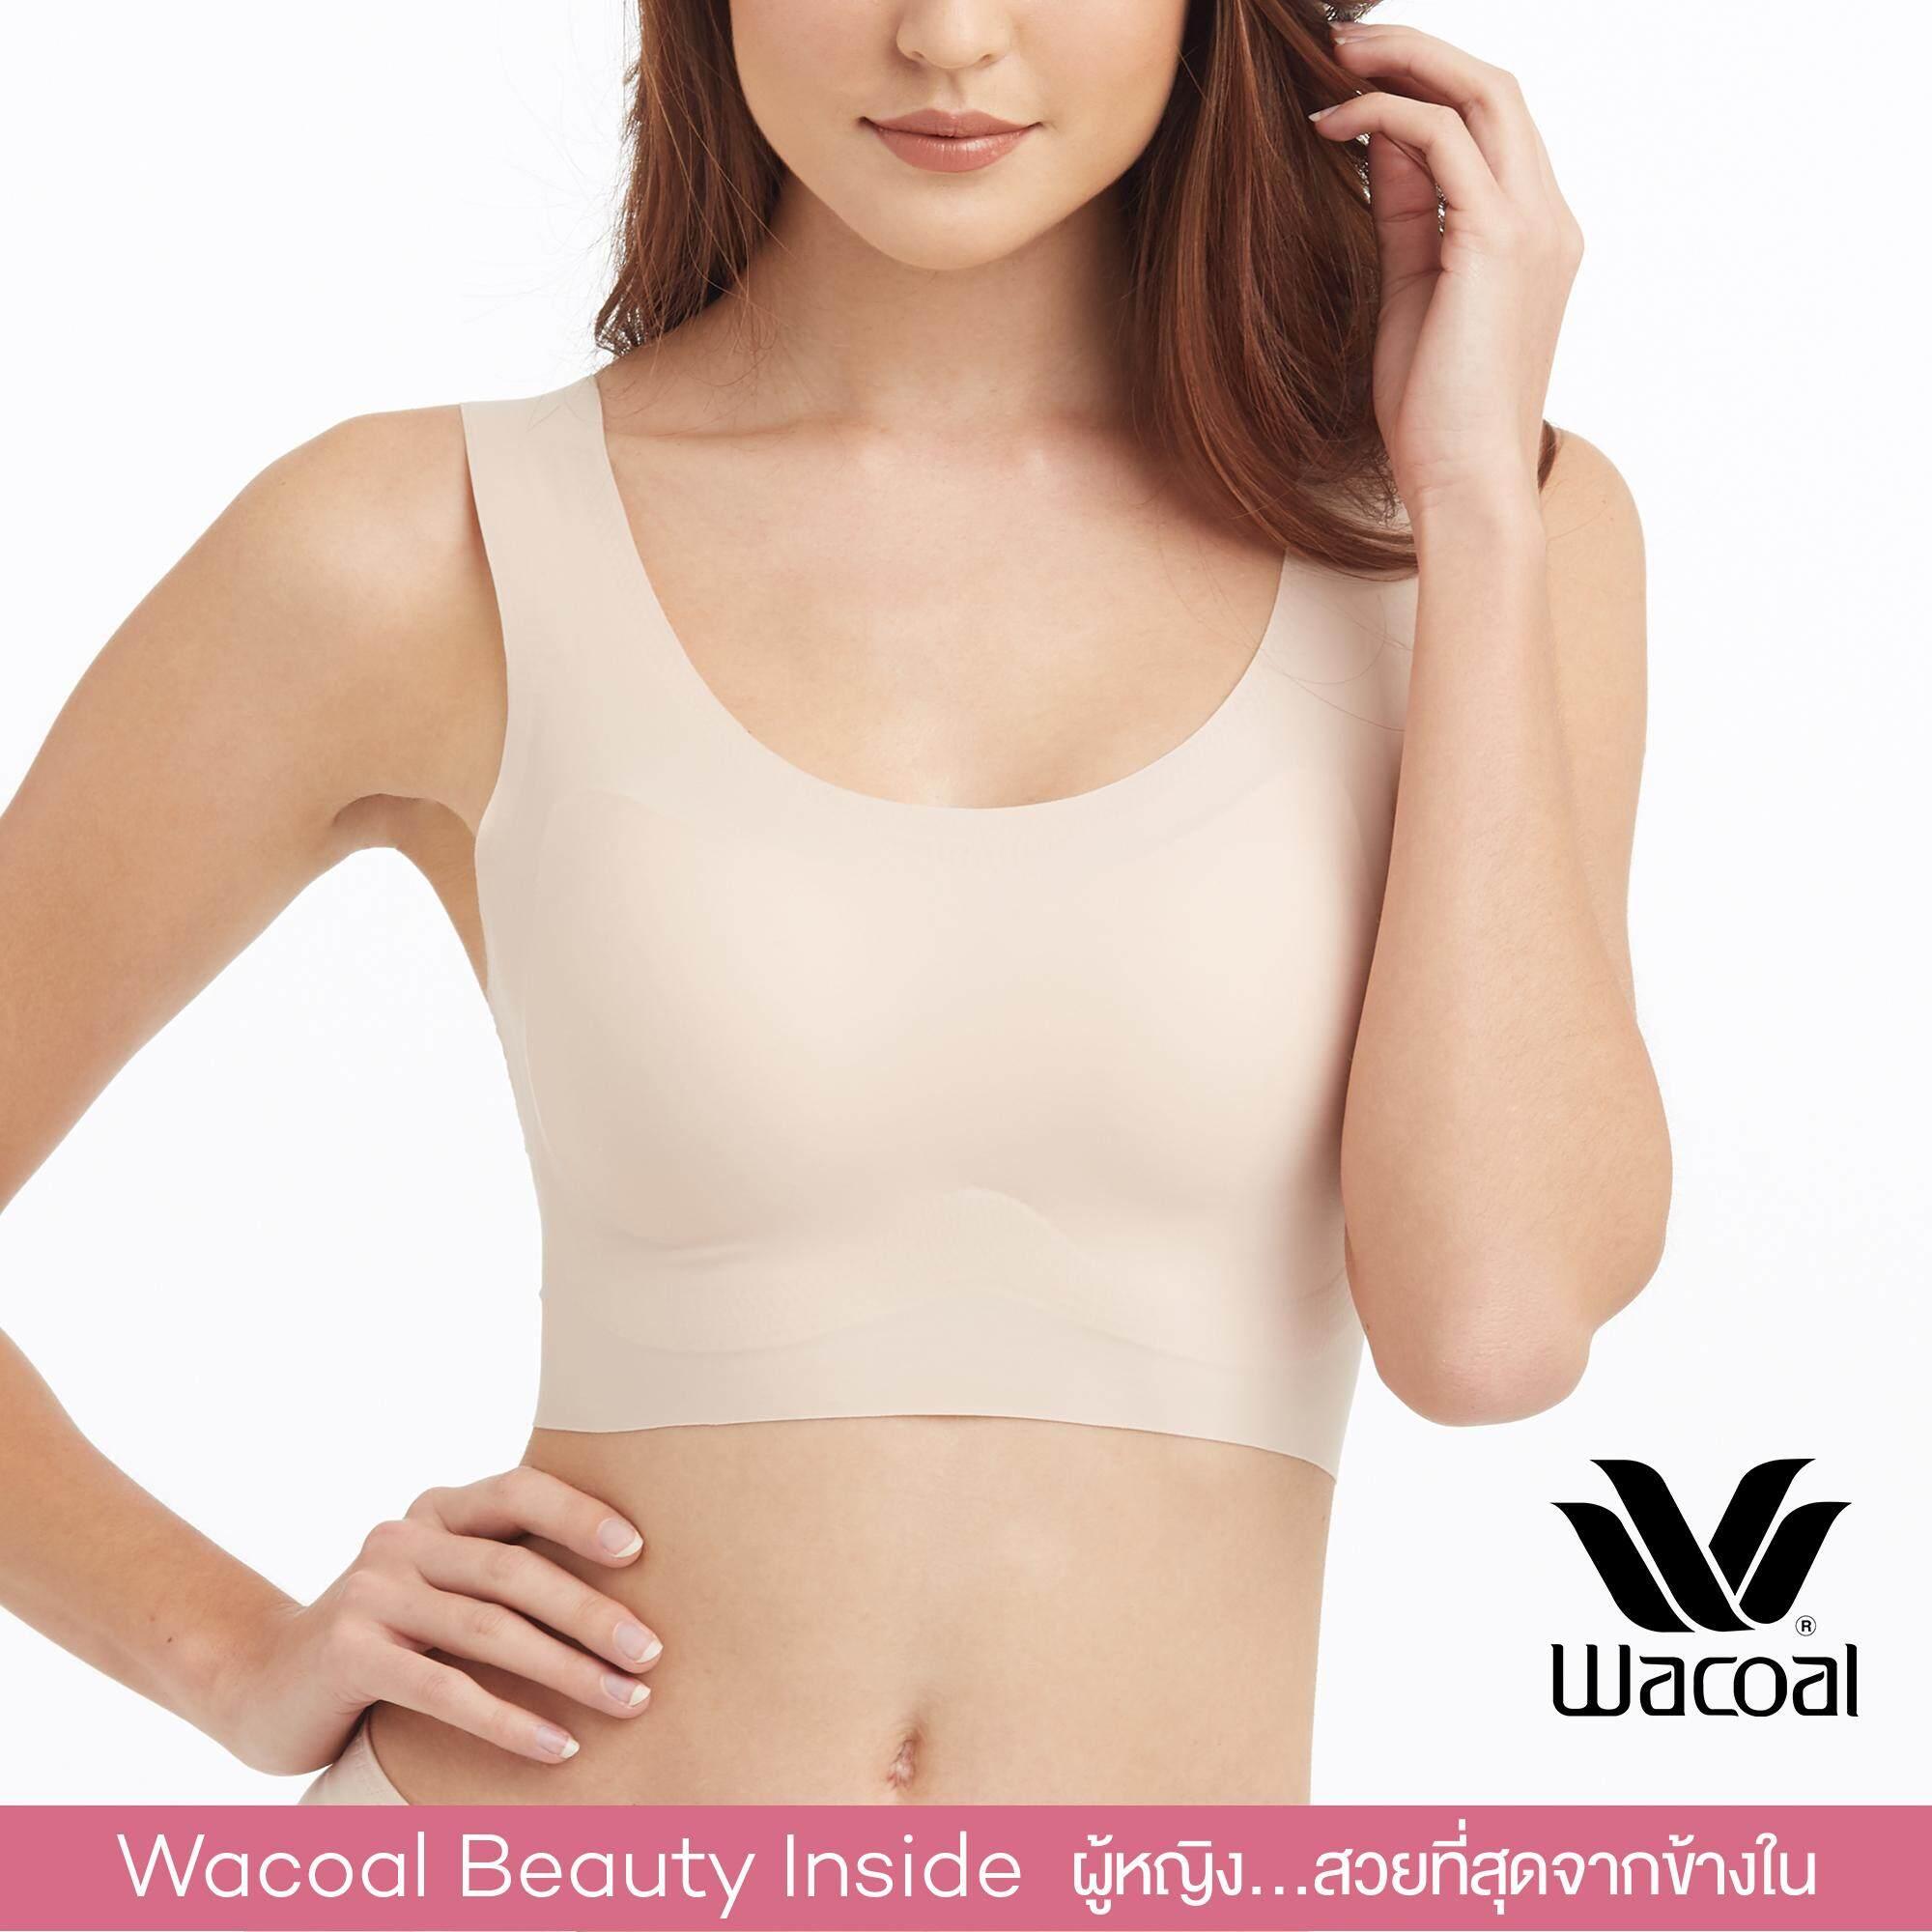 Wacoal Lingerie Casual bra (Feel free bra) บราสวมหัว - WH9E03